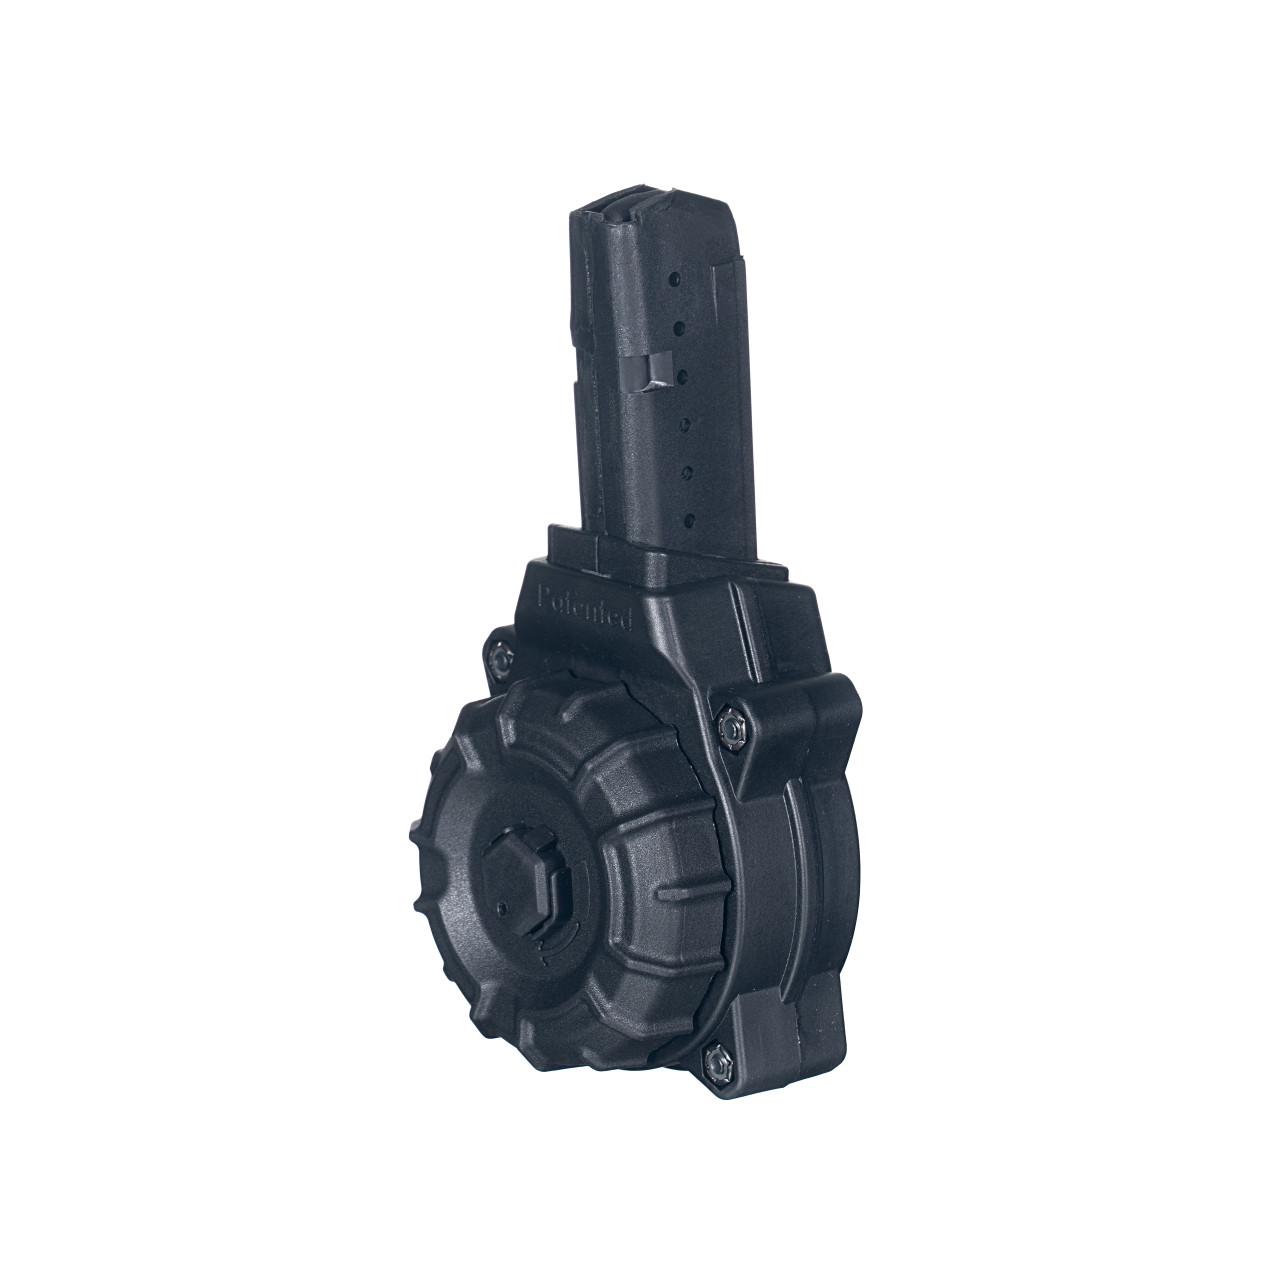 AR-15® 9mm Glock® Style Mag (30) Rd - Black Polymer Drum